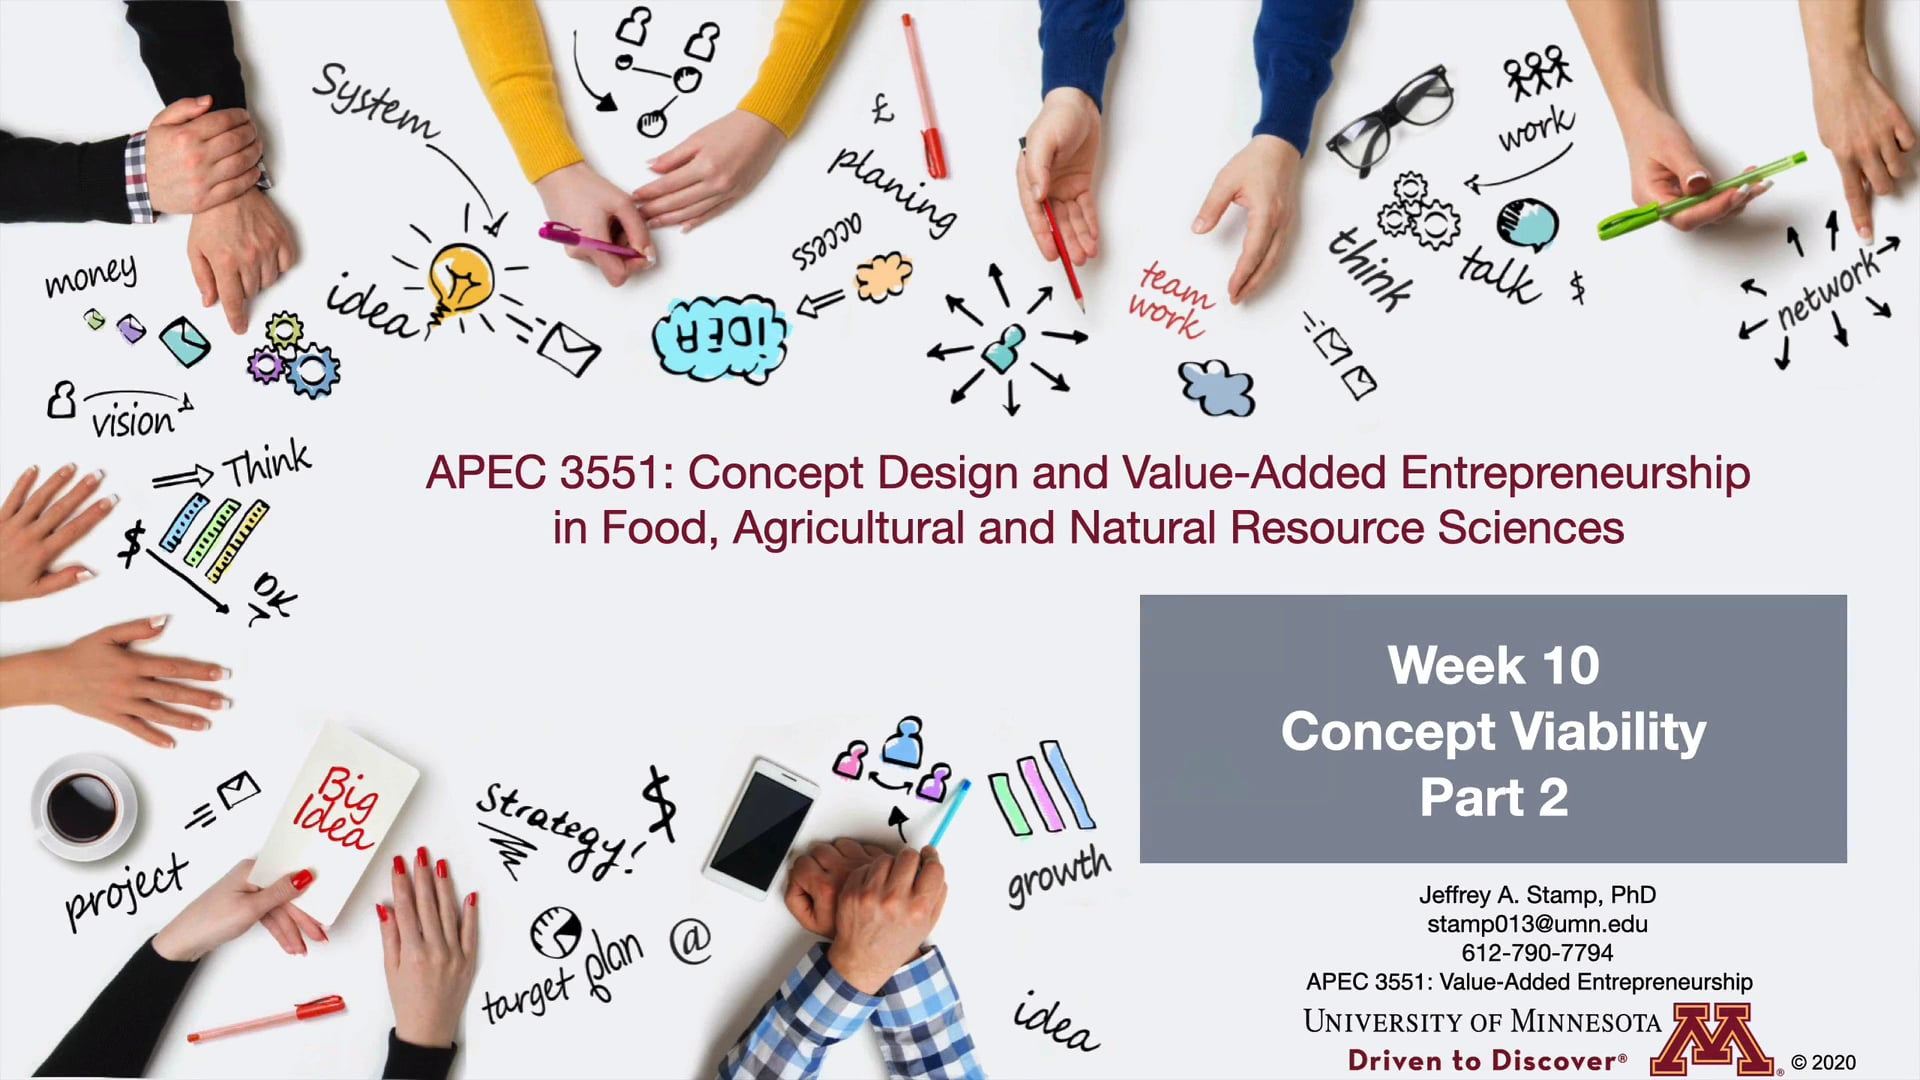 APEC 3551 F20 Week 10 Video 1 Part 2 Viability